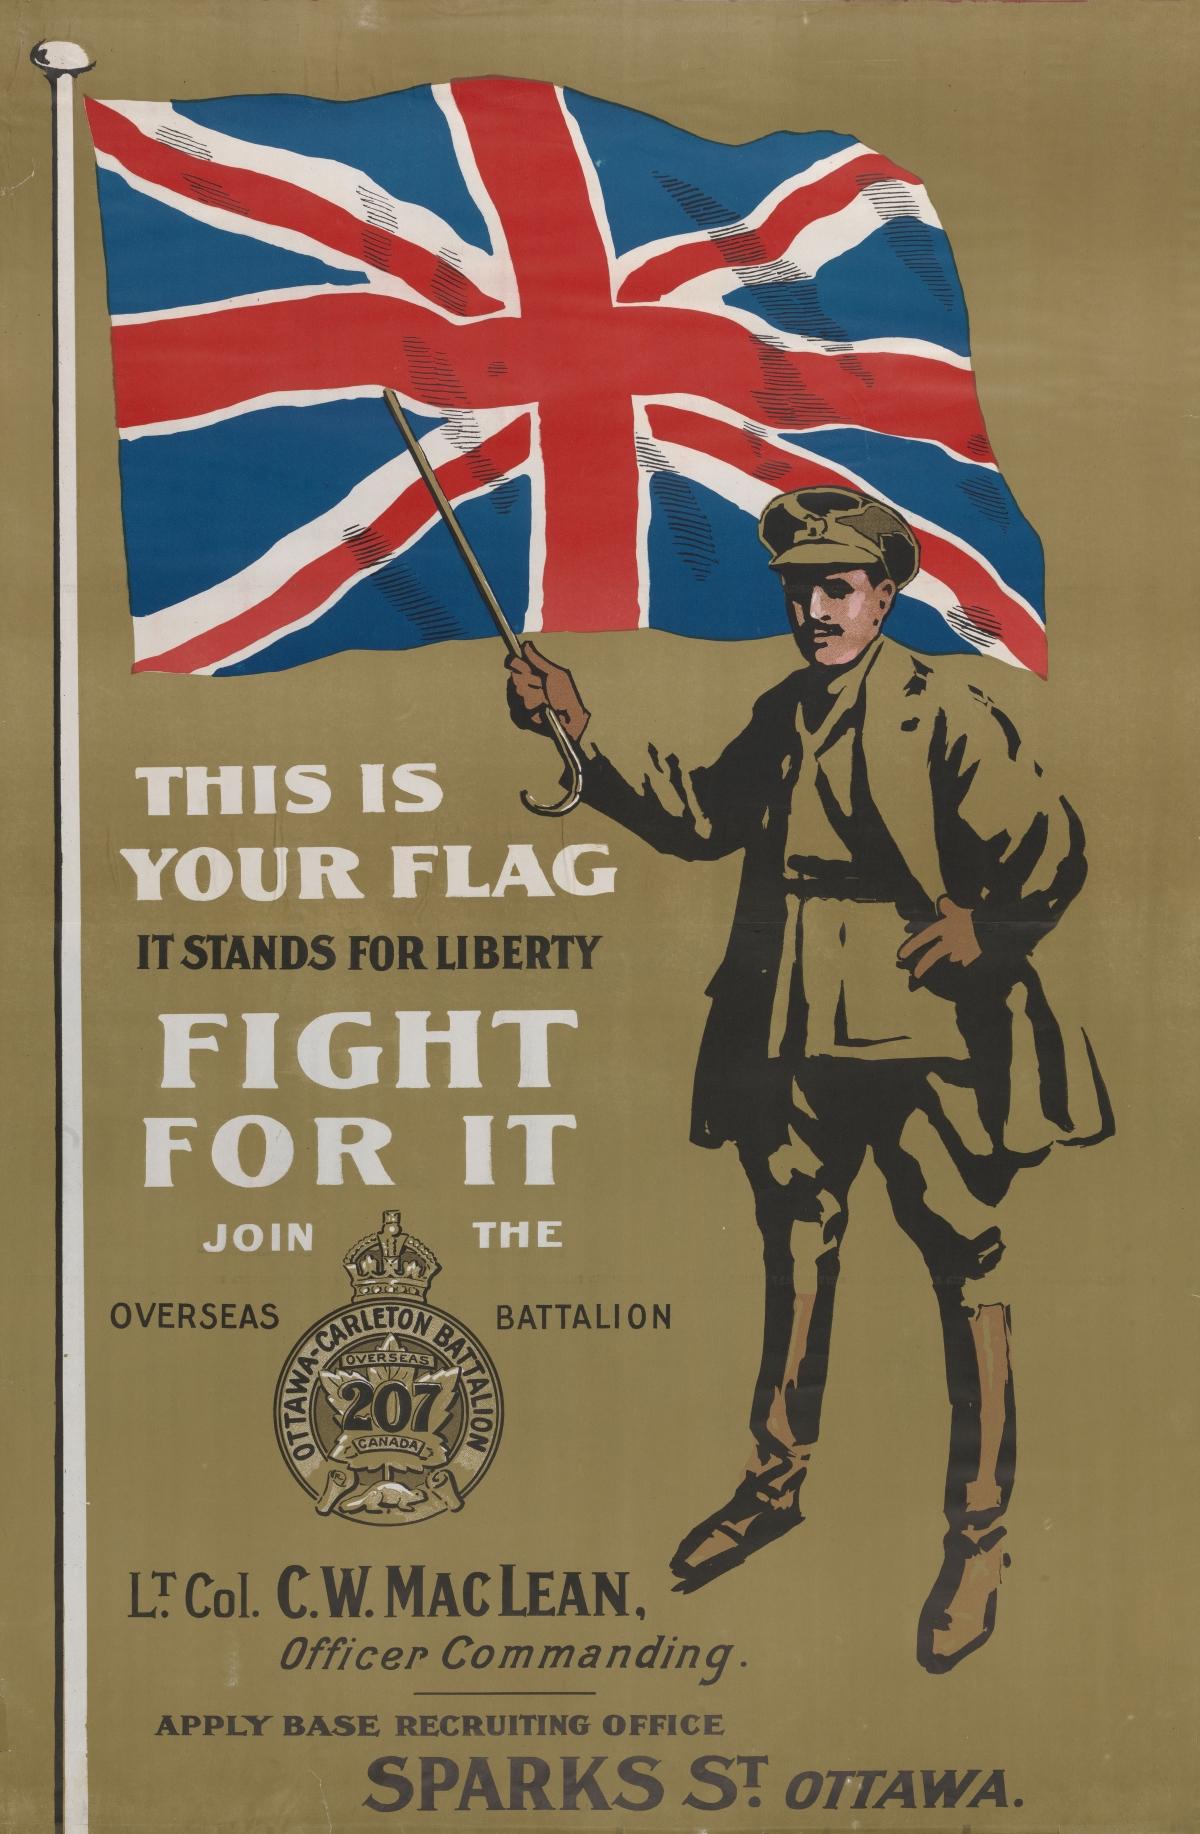 WWI 100th anniversary